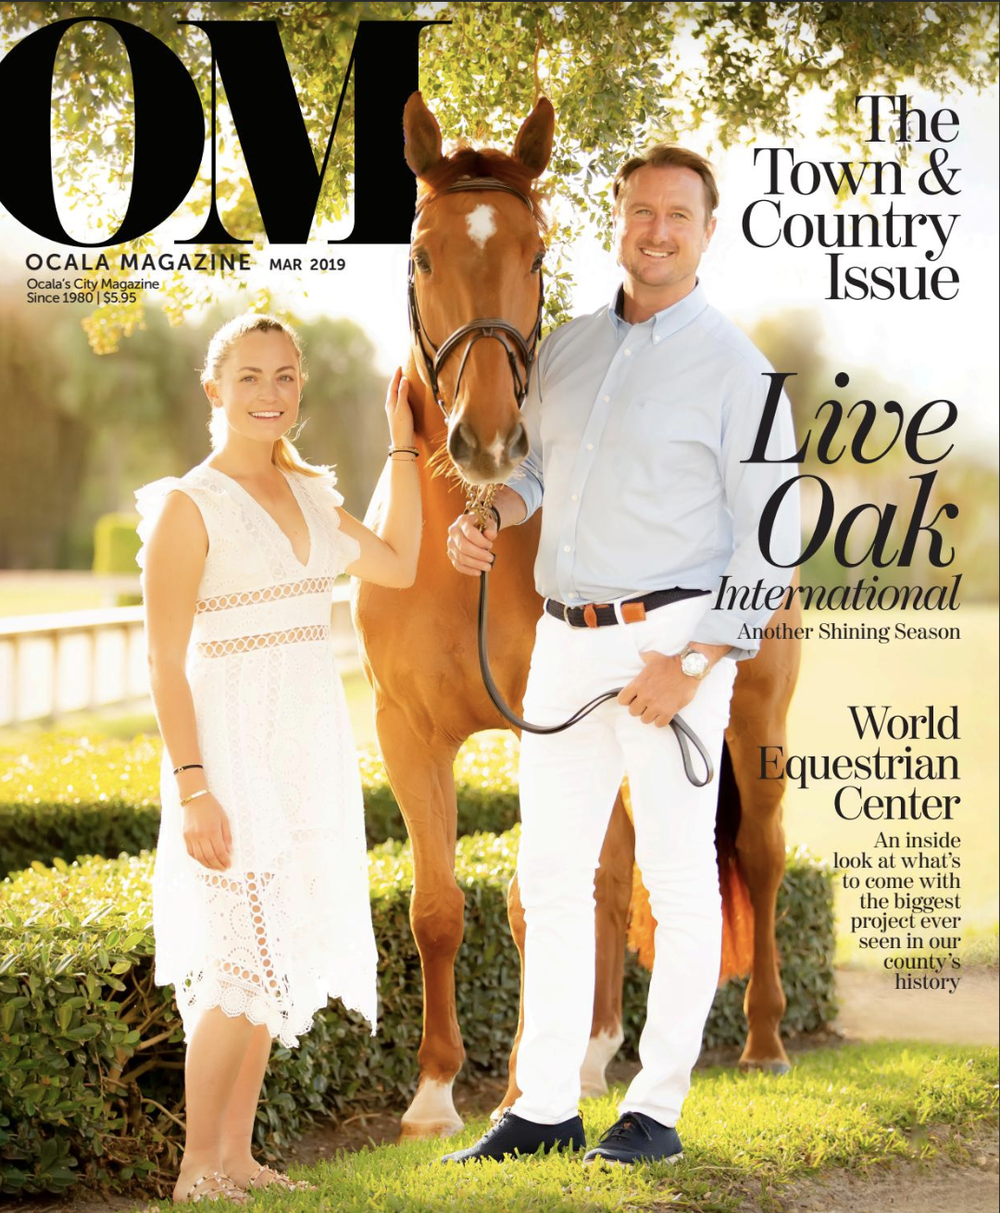 Ocala Magazine, Cover, 2019